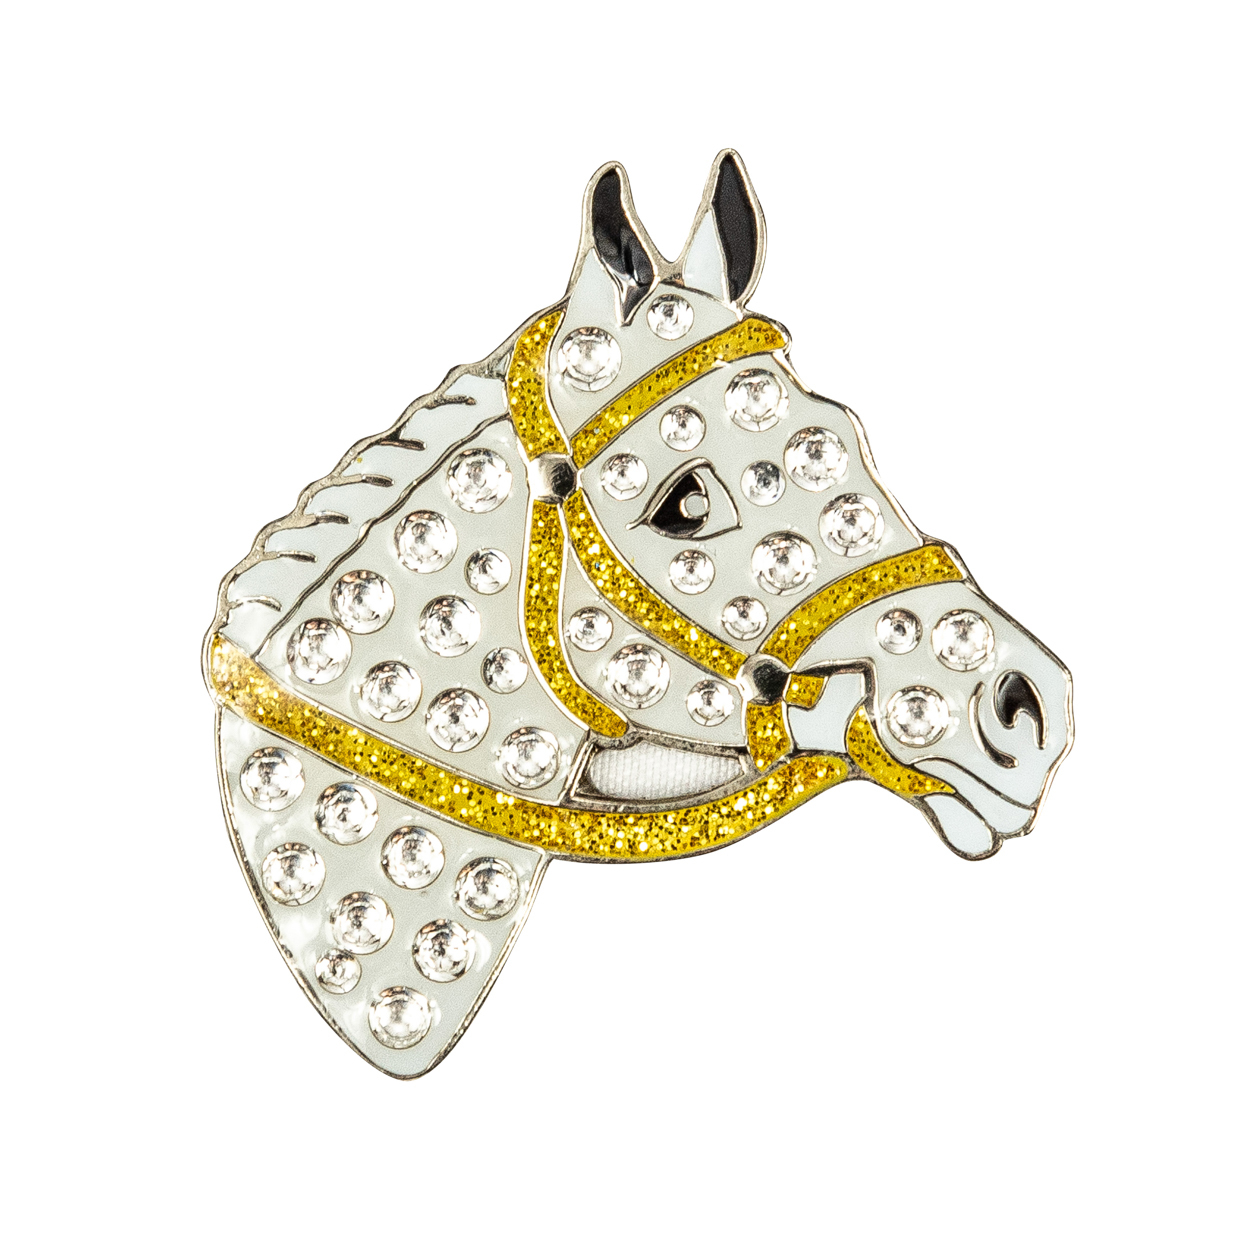 146. Horsehead